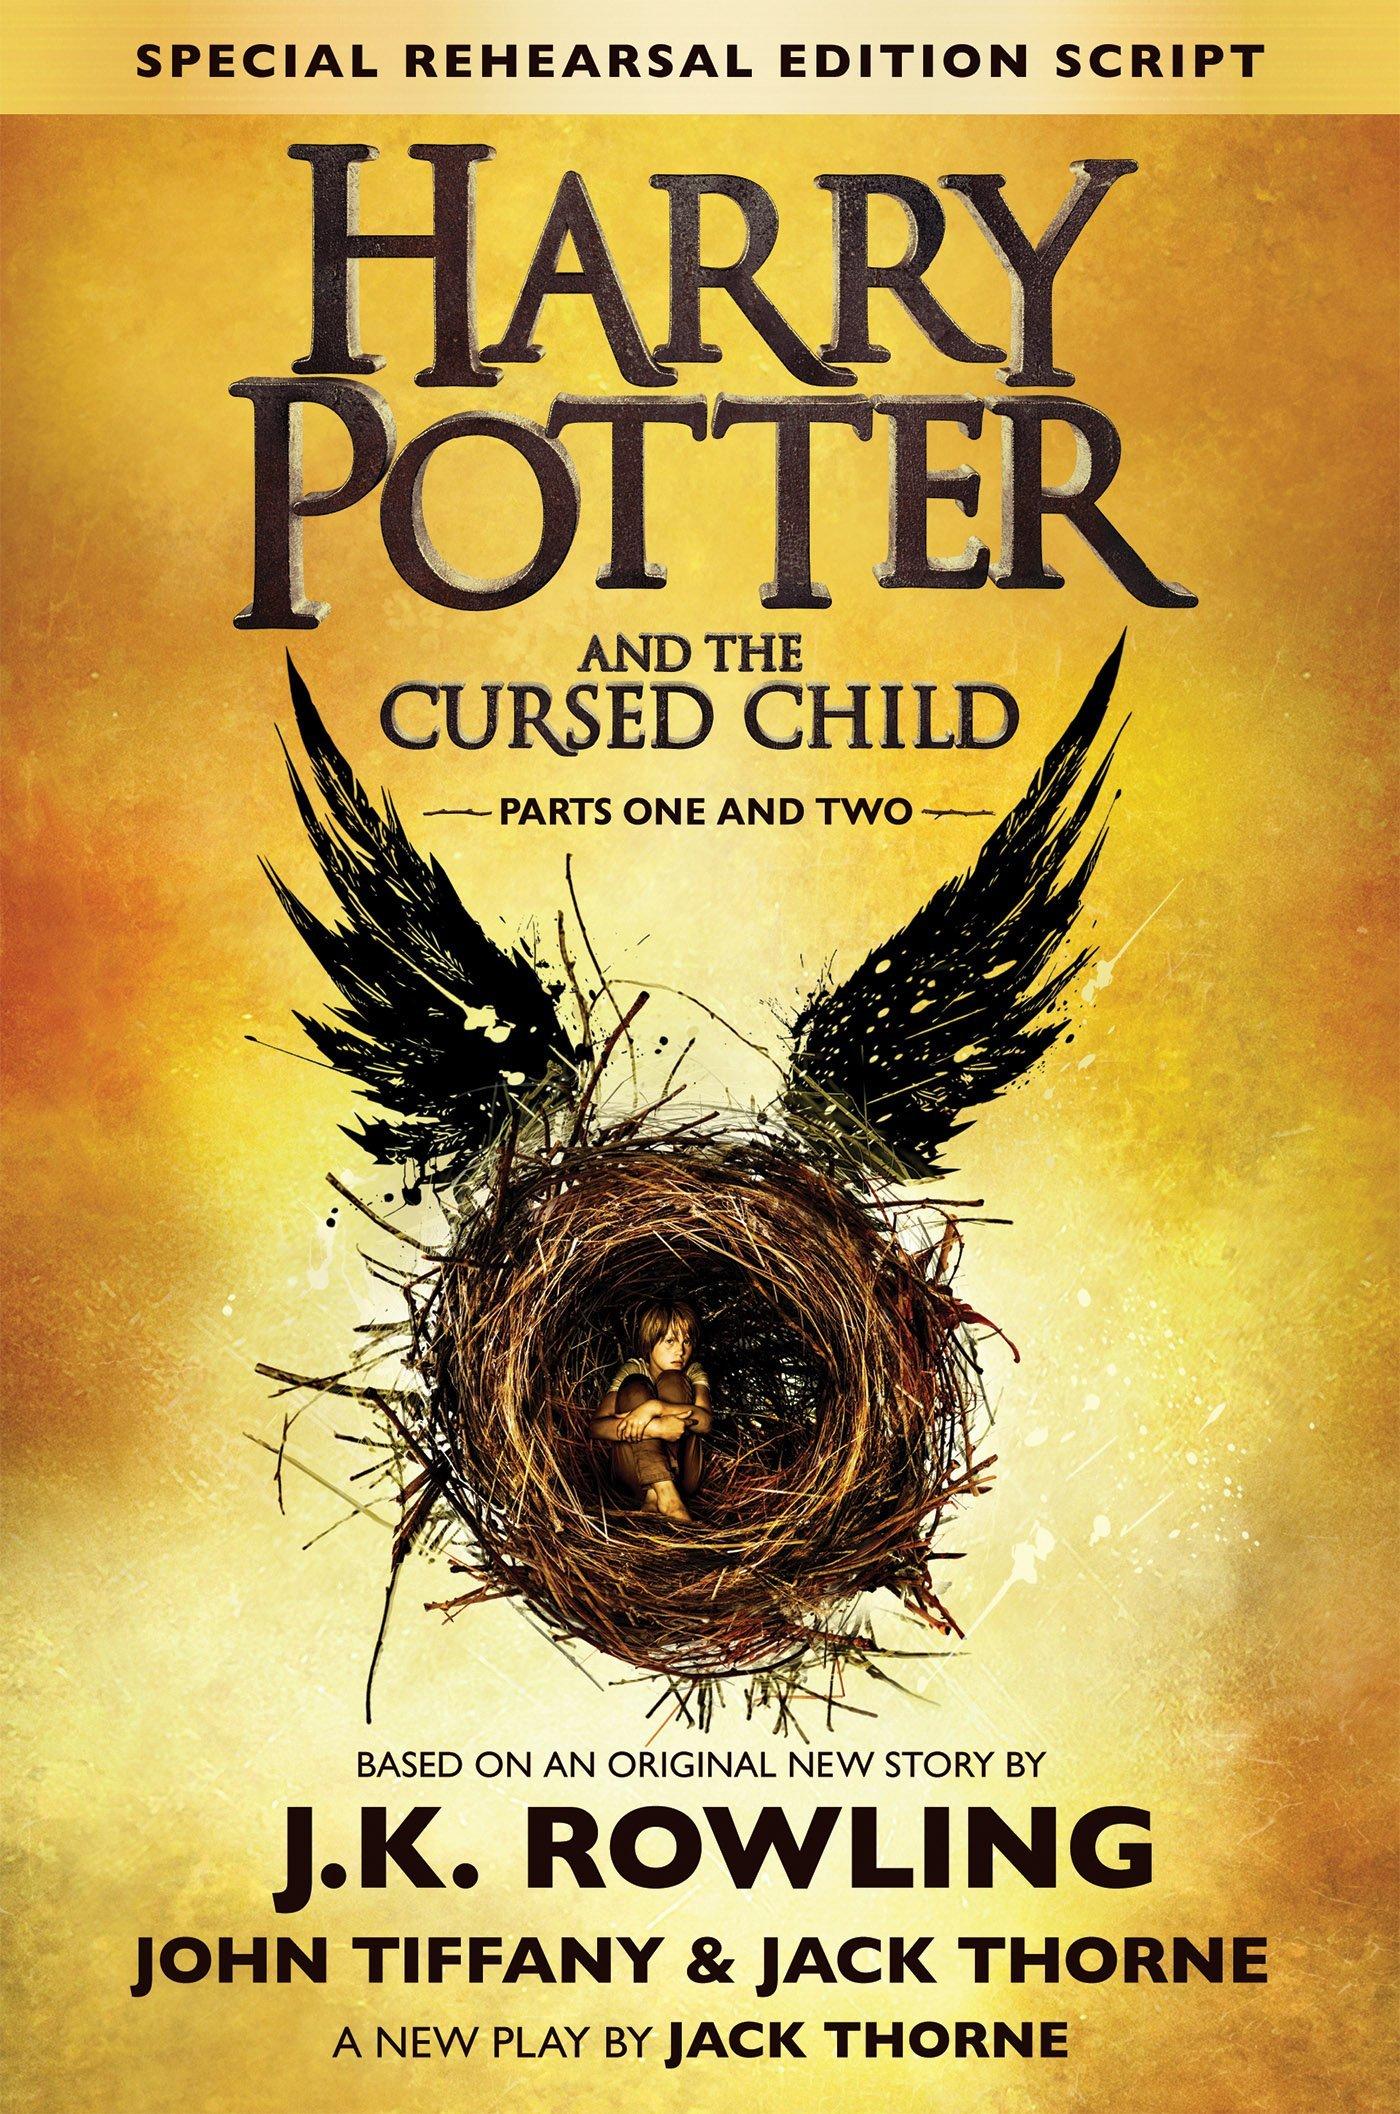 Harry potter 8th book summary